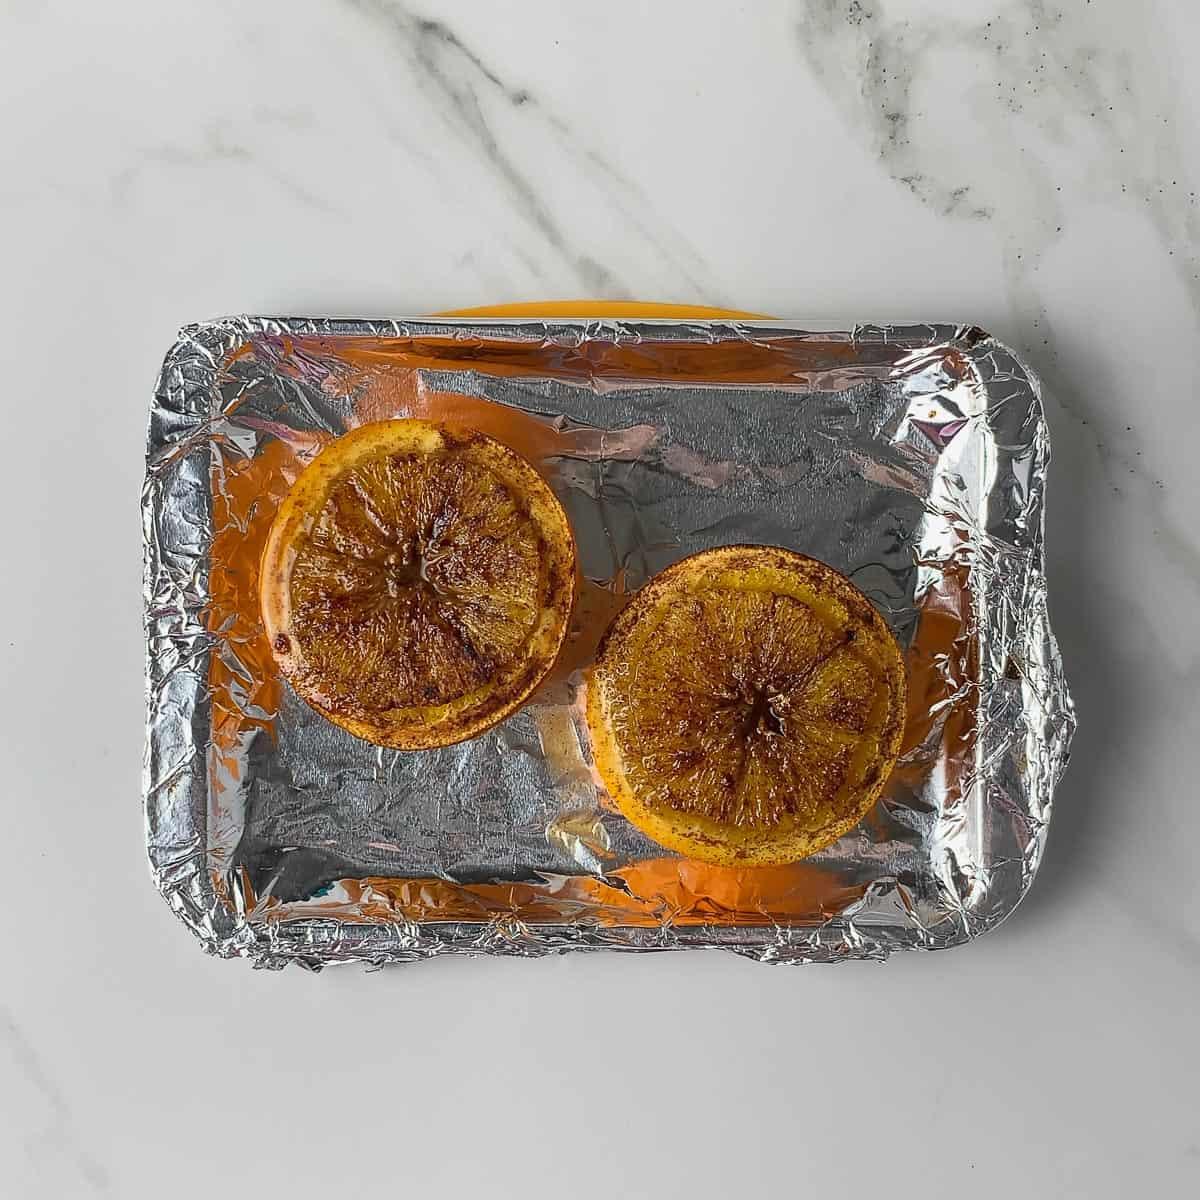 cooked baked oranges on baking sheet